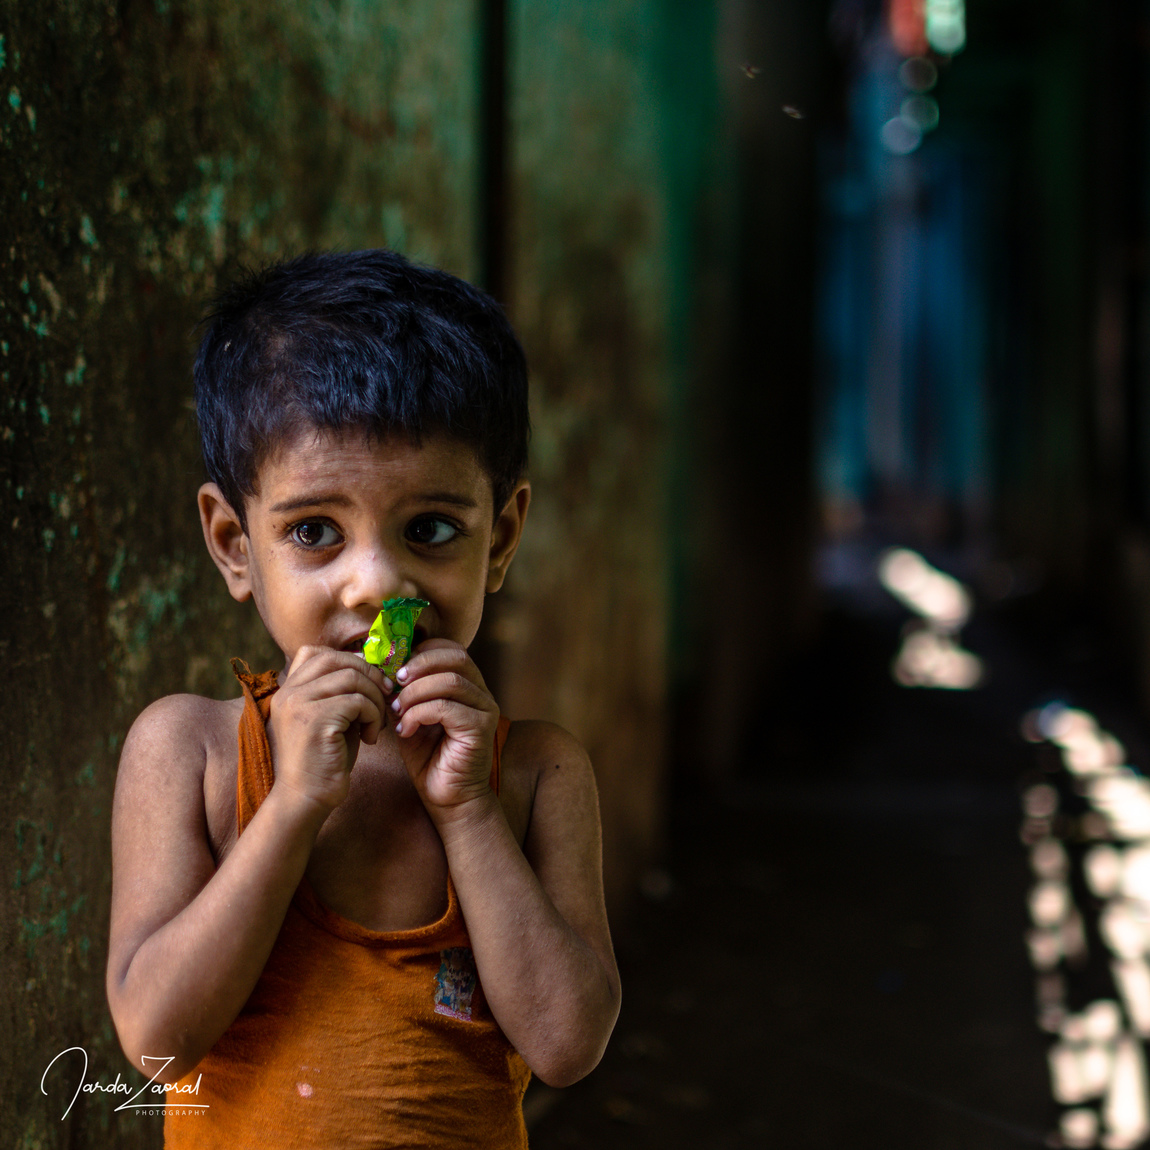 Jaromir Zaoral - Barn i fattiga länder